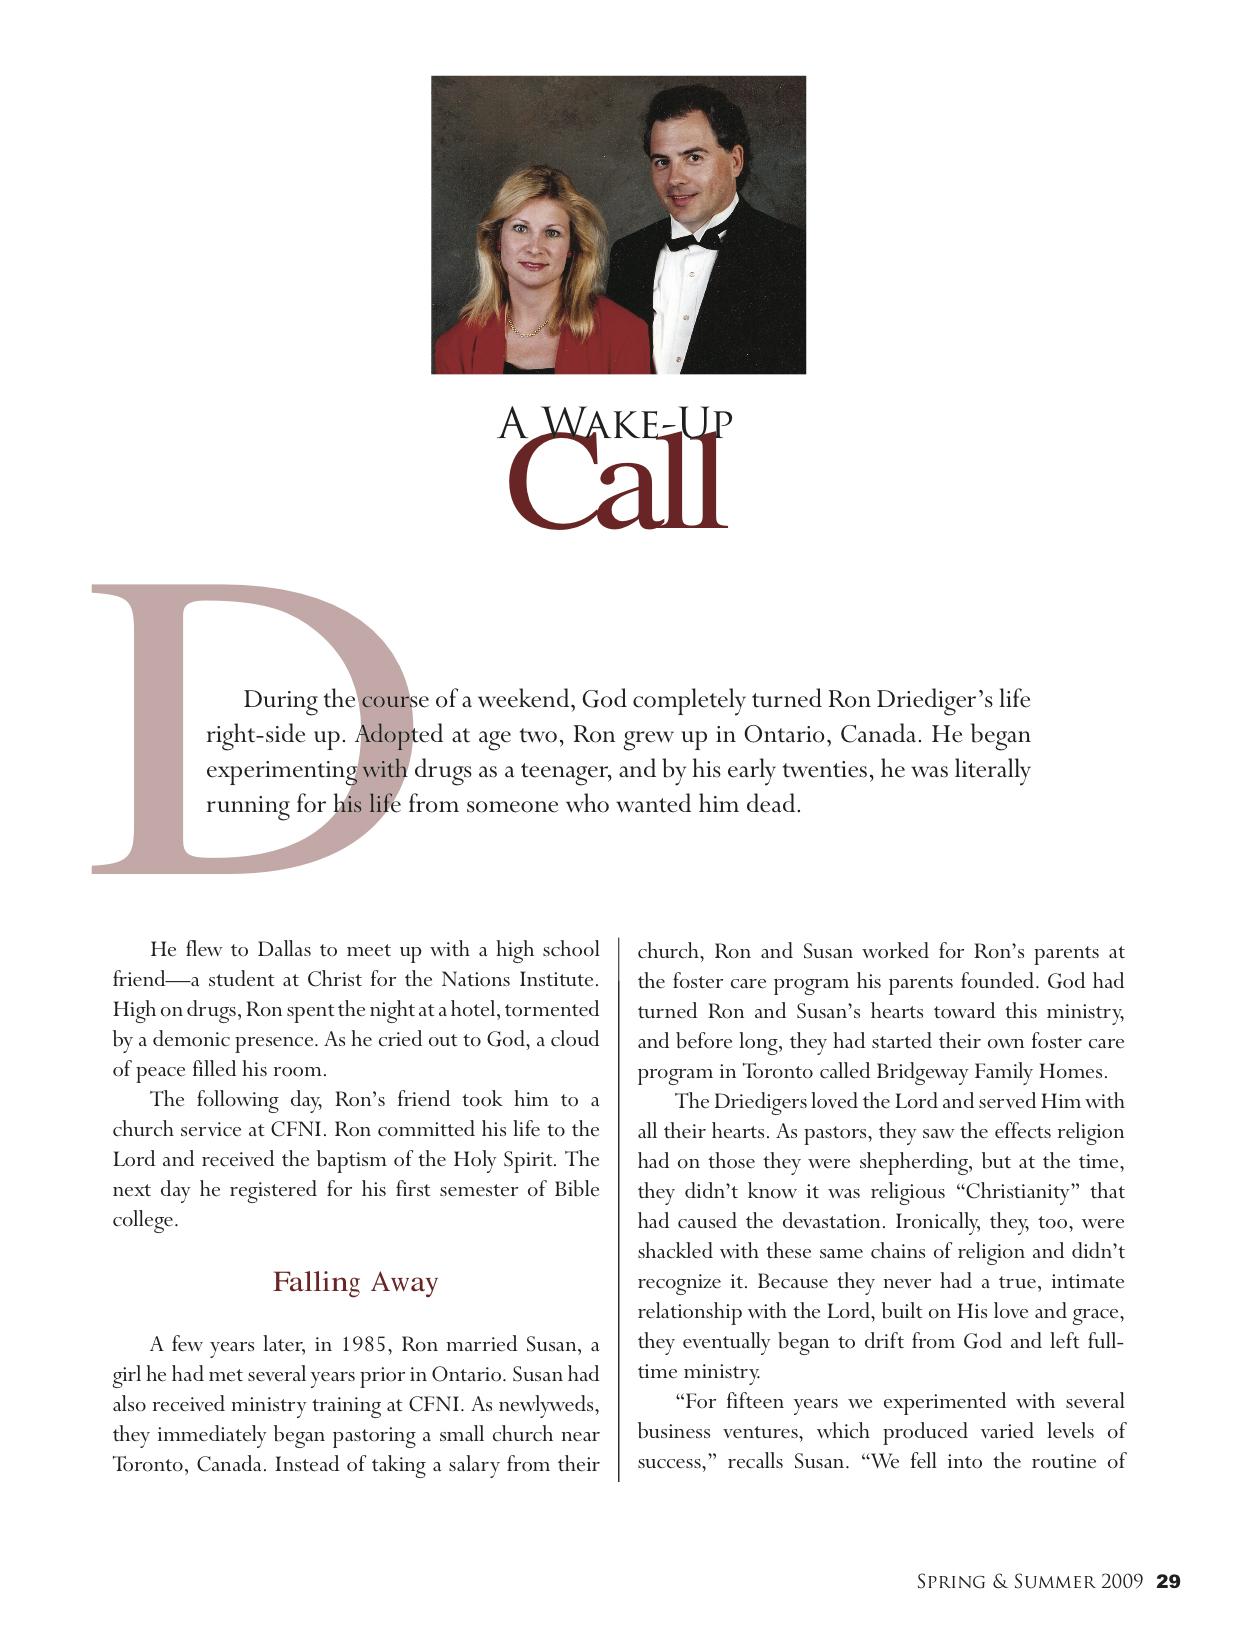 A Wake Up Call | Gospel Truth Magazine Spring/Summer 2009 | P 29